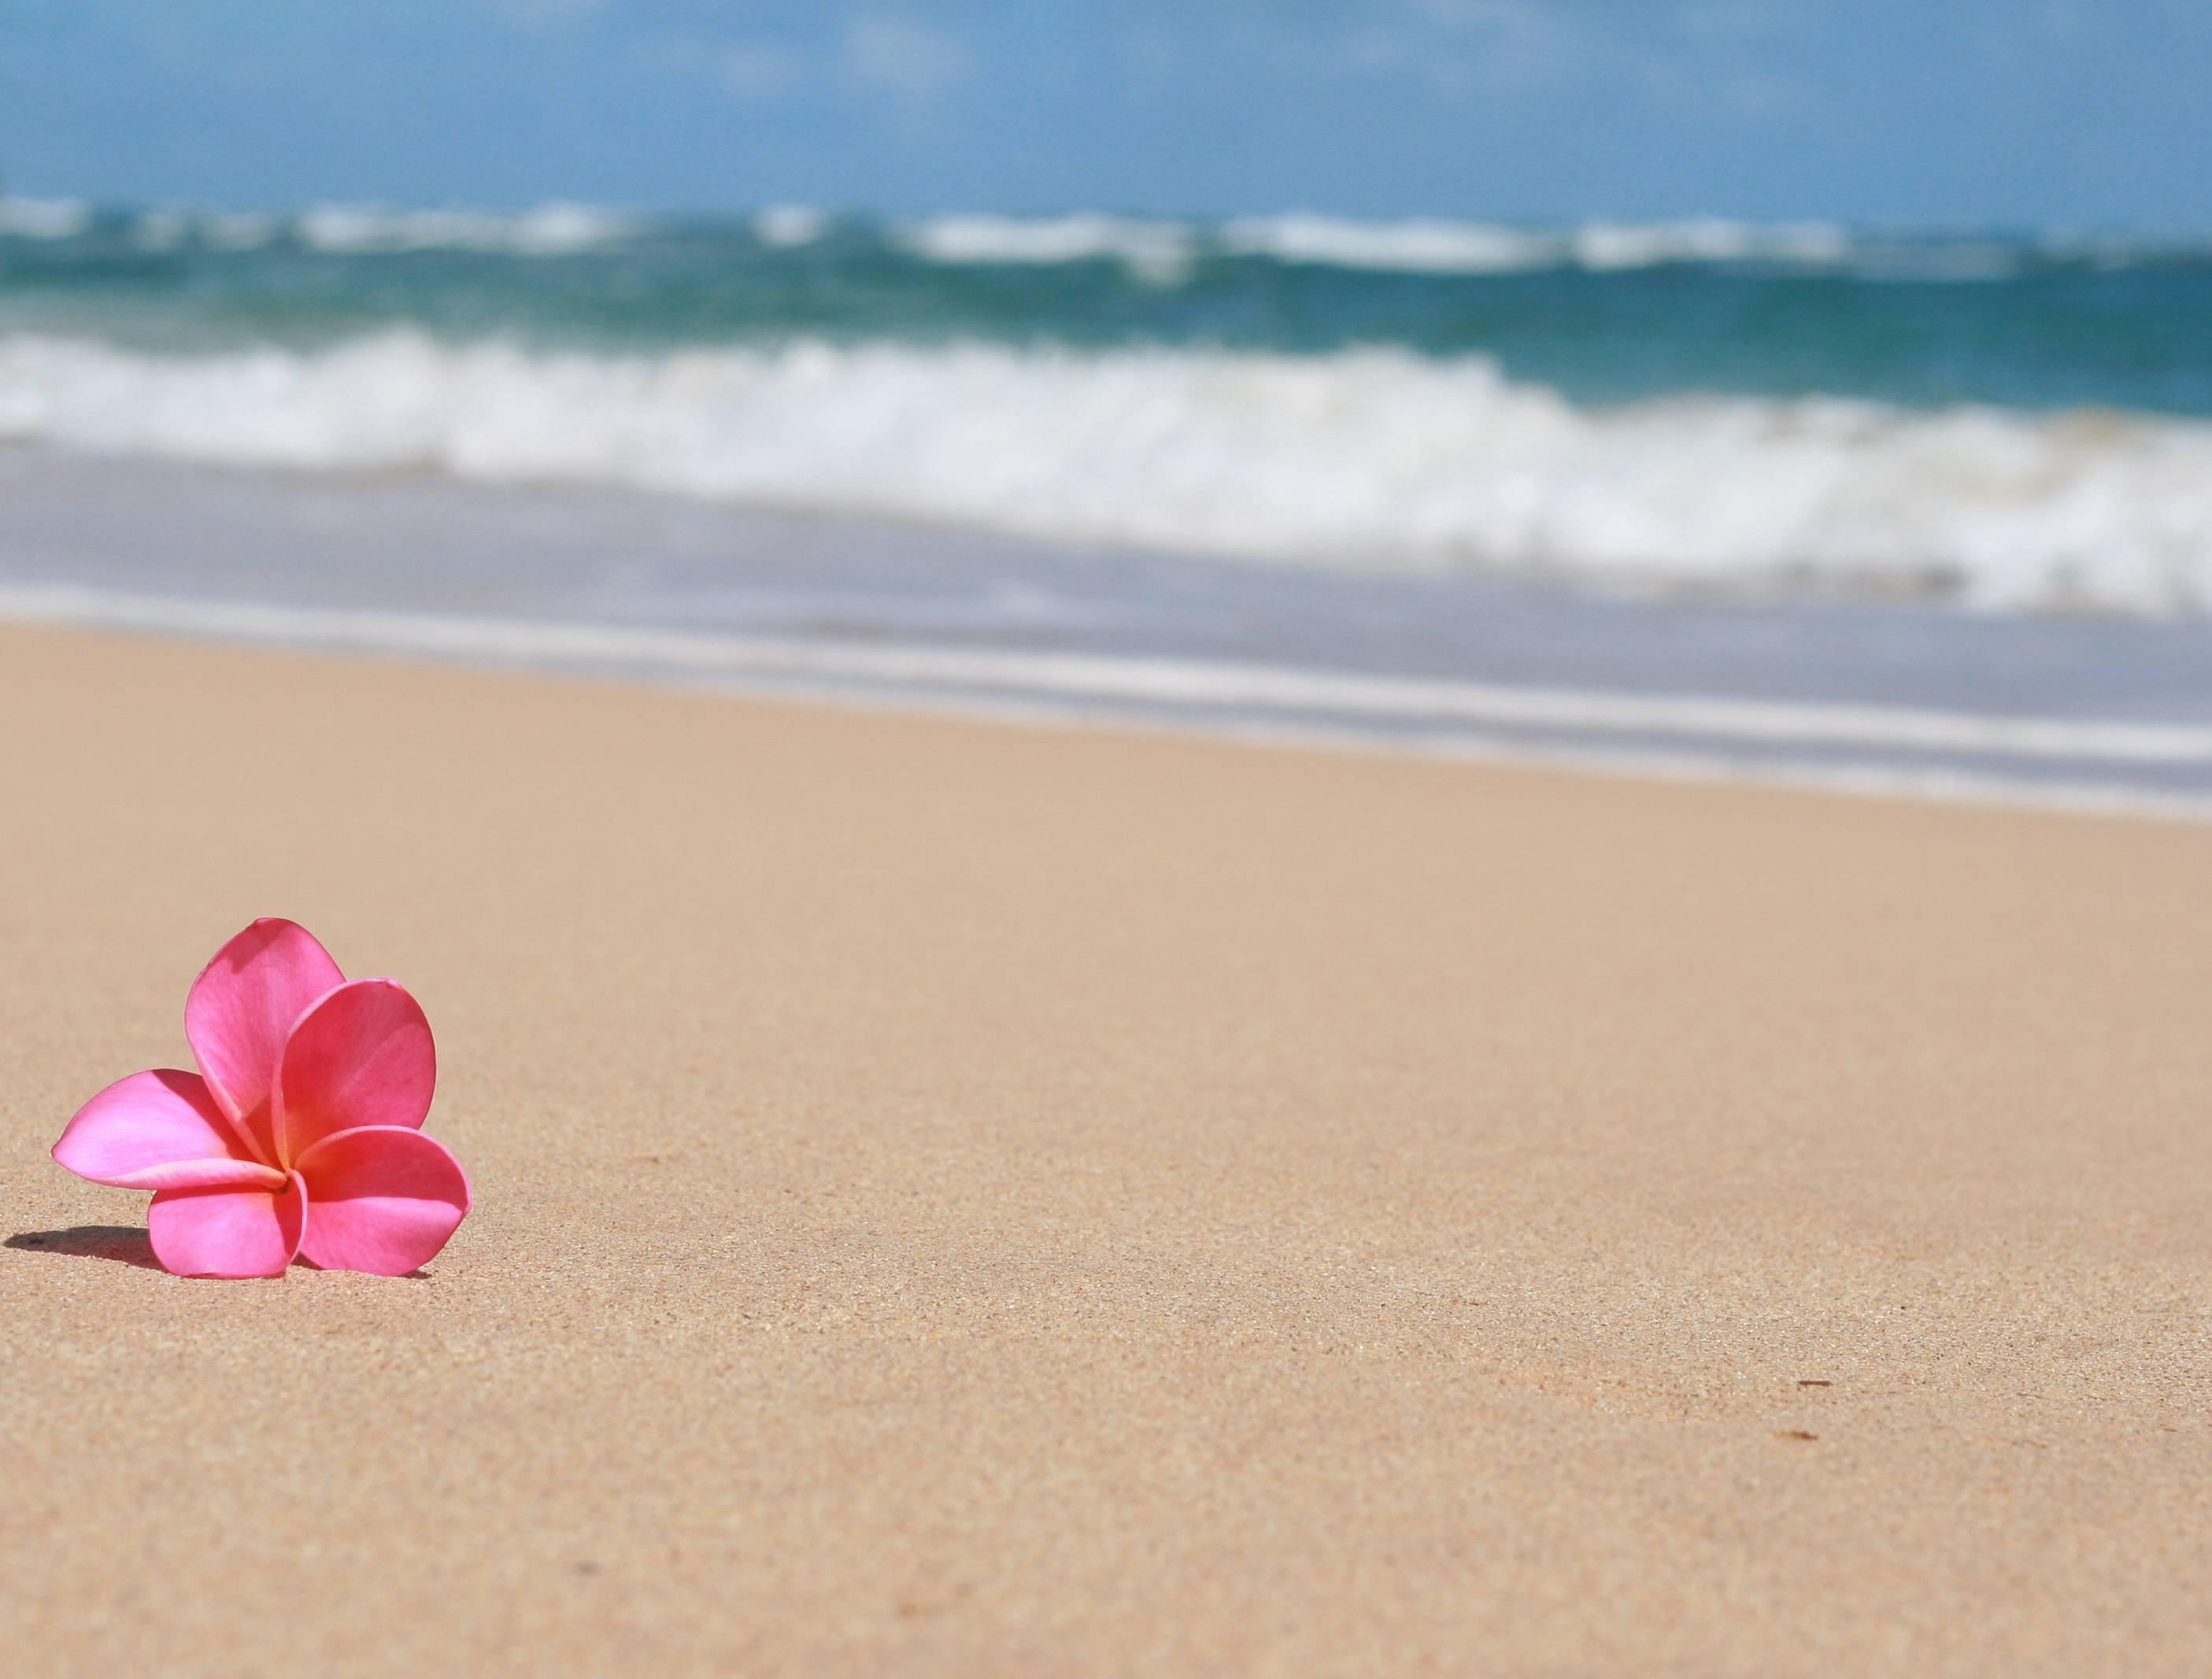 Res: 2810x2133, Top HD Sandy Beach Wallpaper | Nature HD | 287.85 KB src